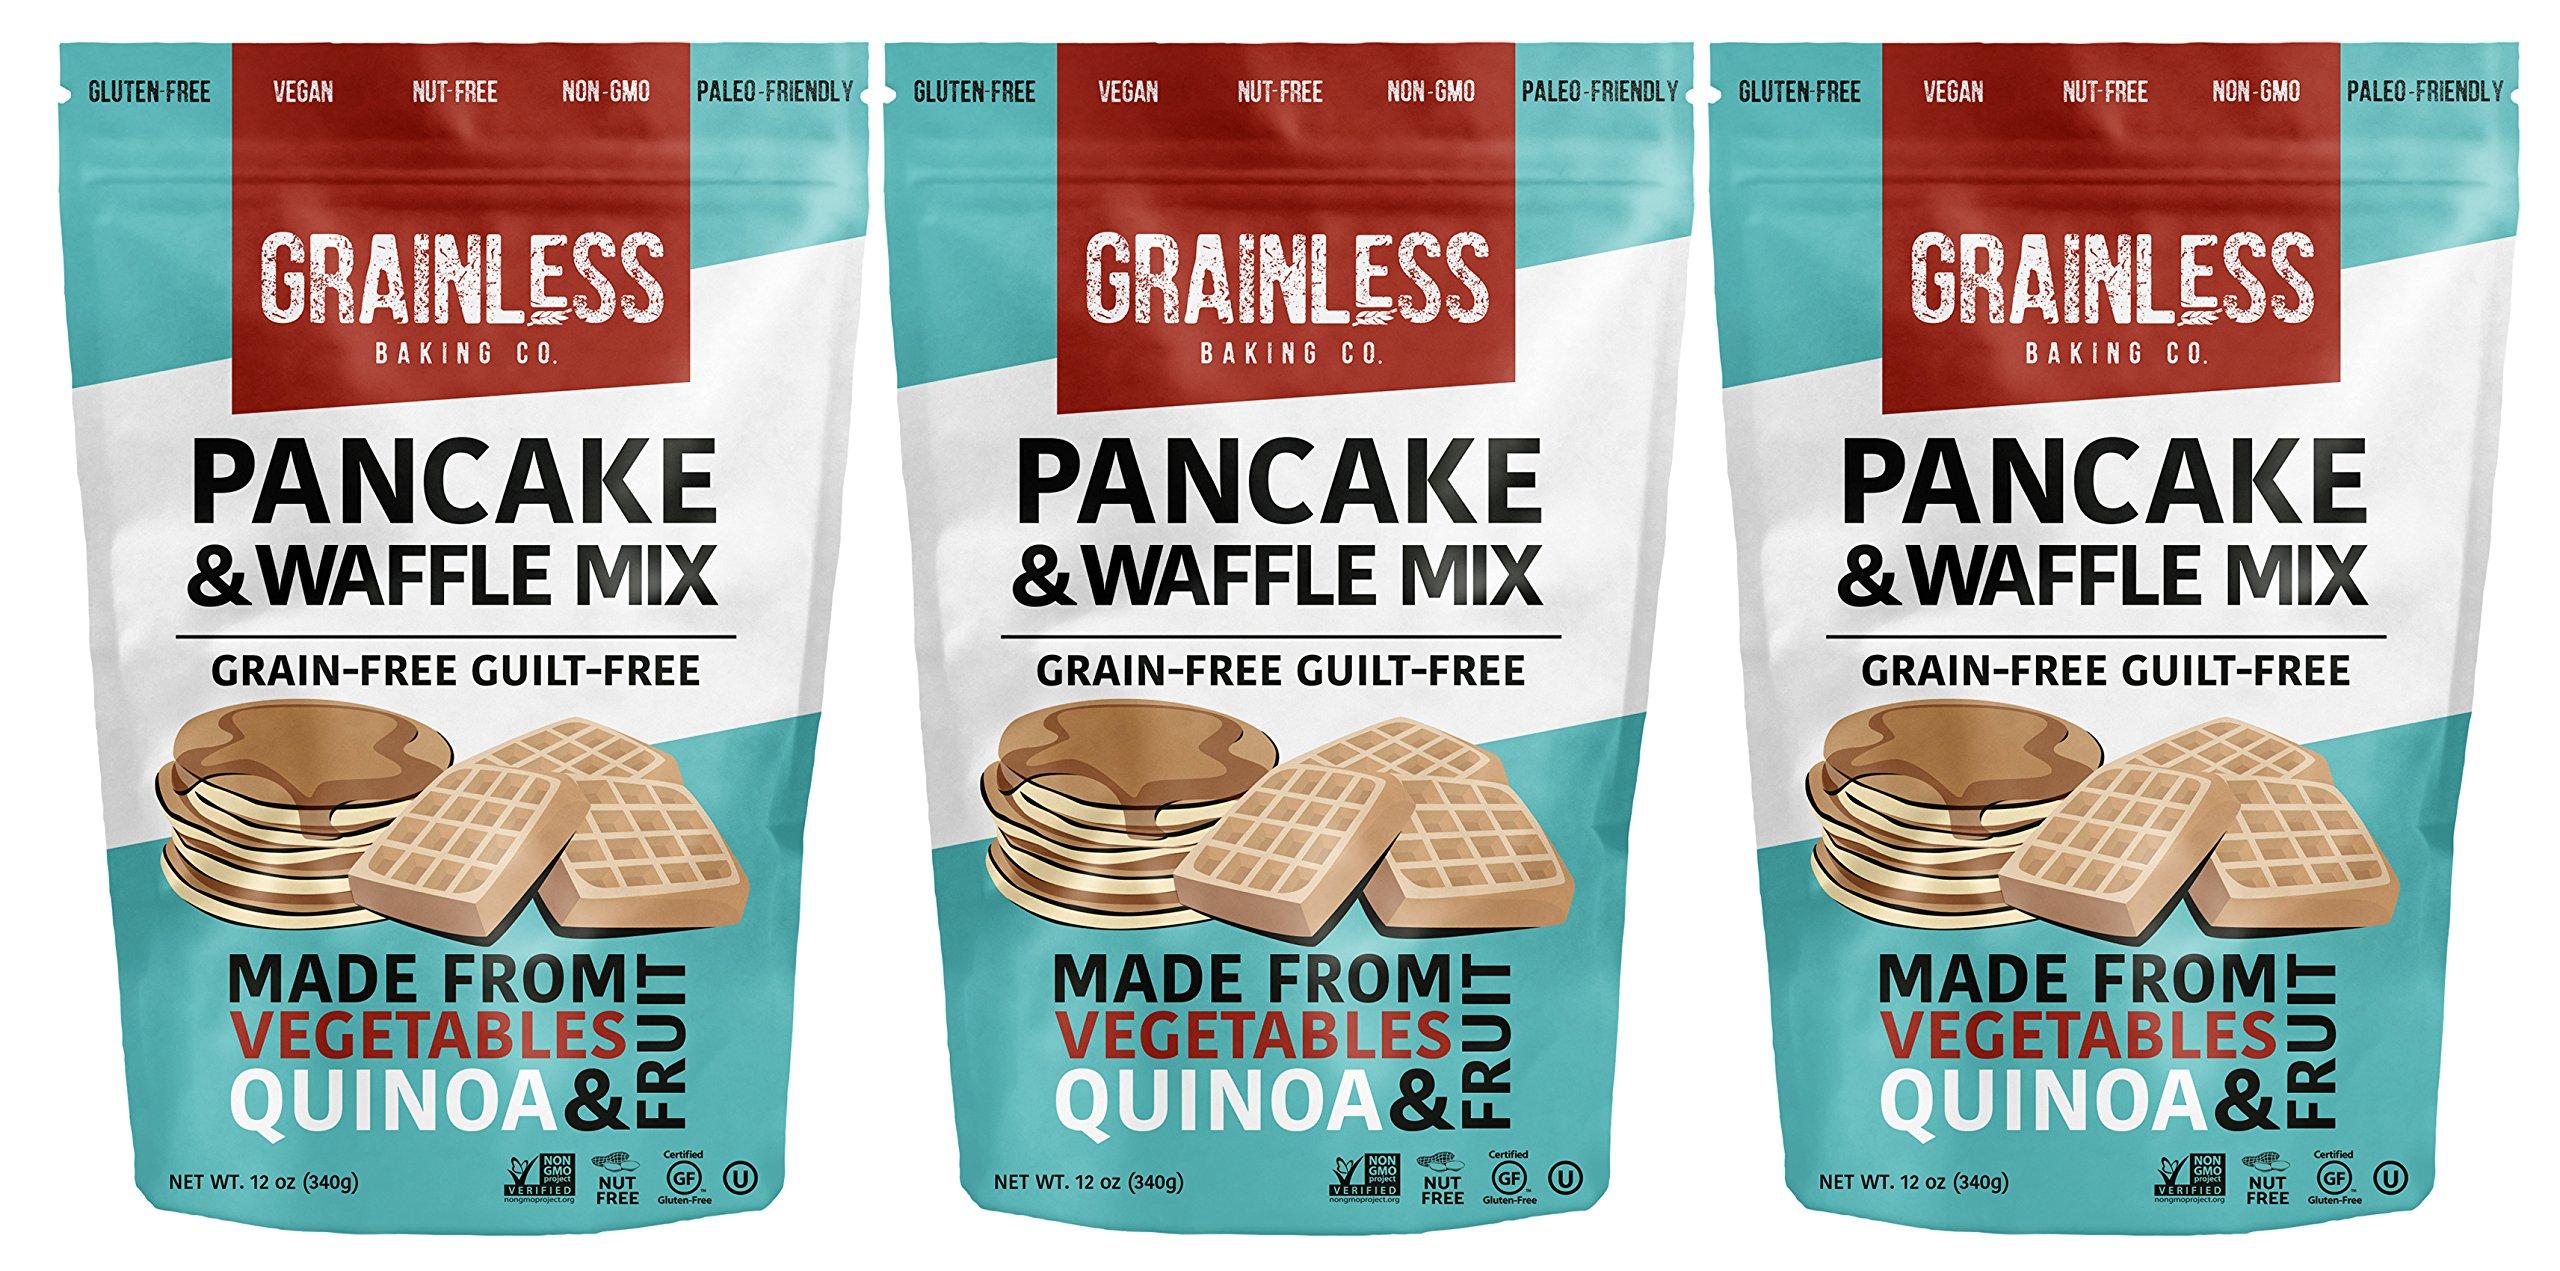 Grainless Grain Free Pancake Mix | Grain-Free Waffle Mix (Flour) - Baking Flour for Grain Free Pancakes, Grain-Less Waffles & Crepes | Gluten Free, Nut & Soy Free, Paleo Friendly, OU Kosher, 3 Packs by Grainless Baking Company